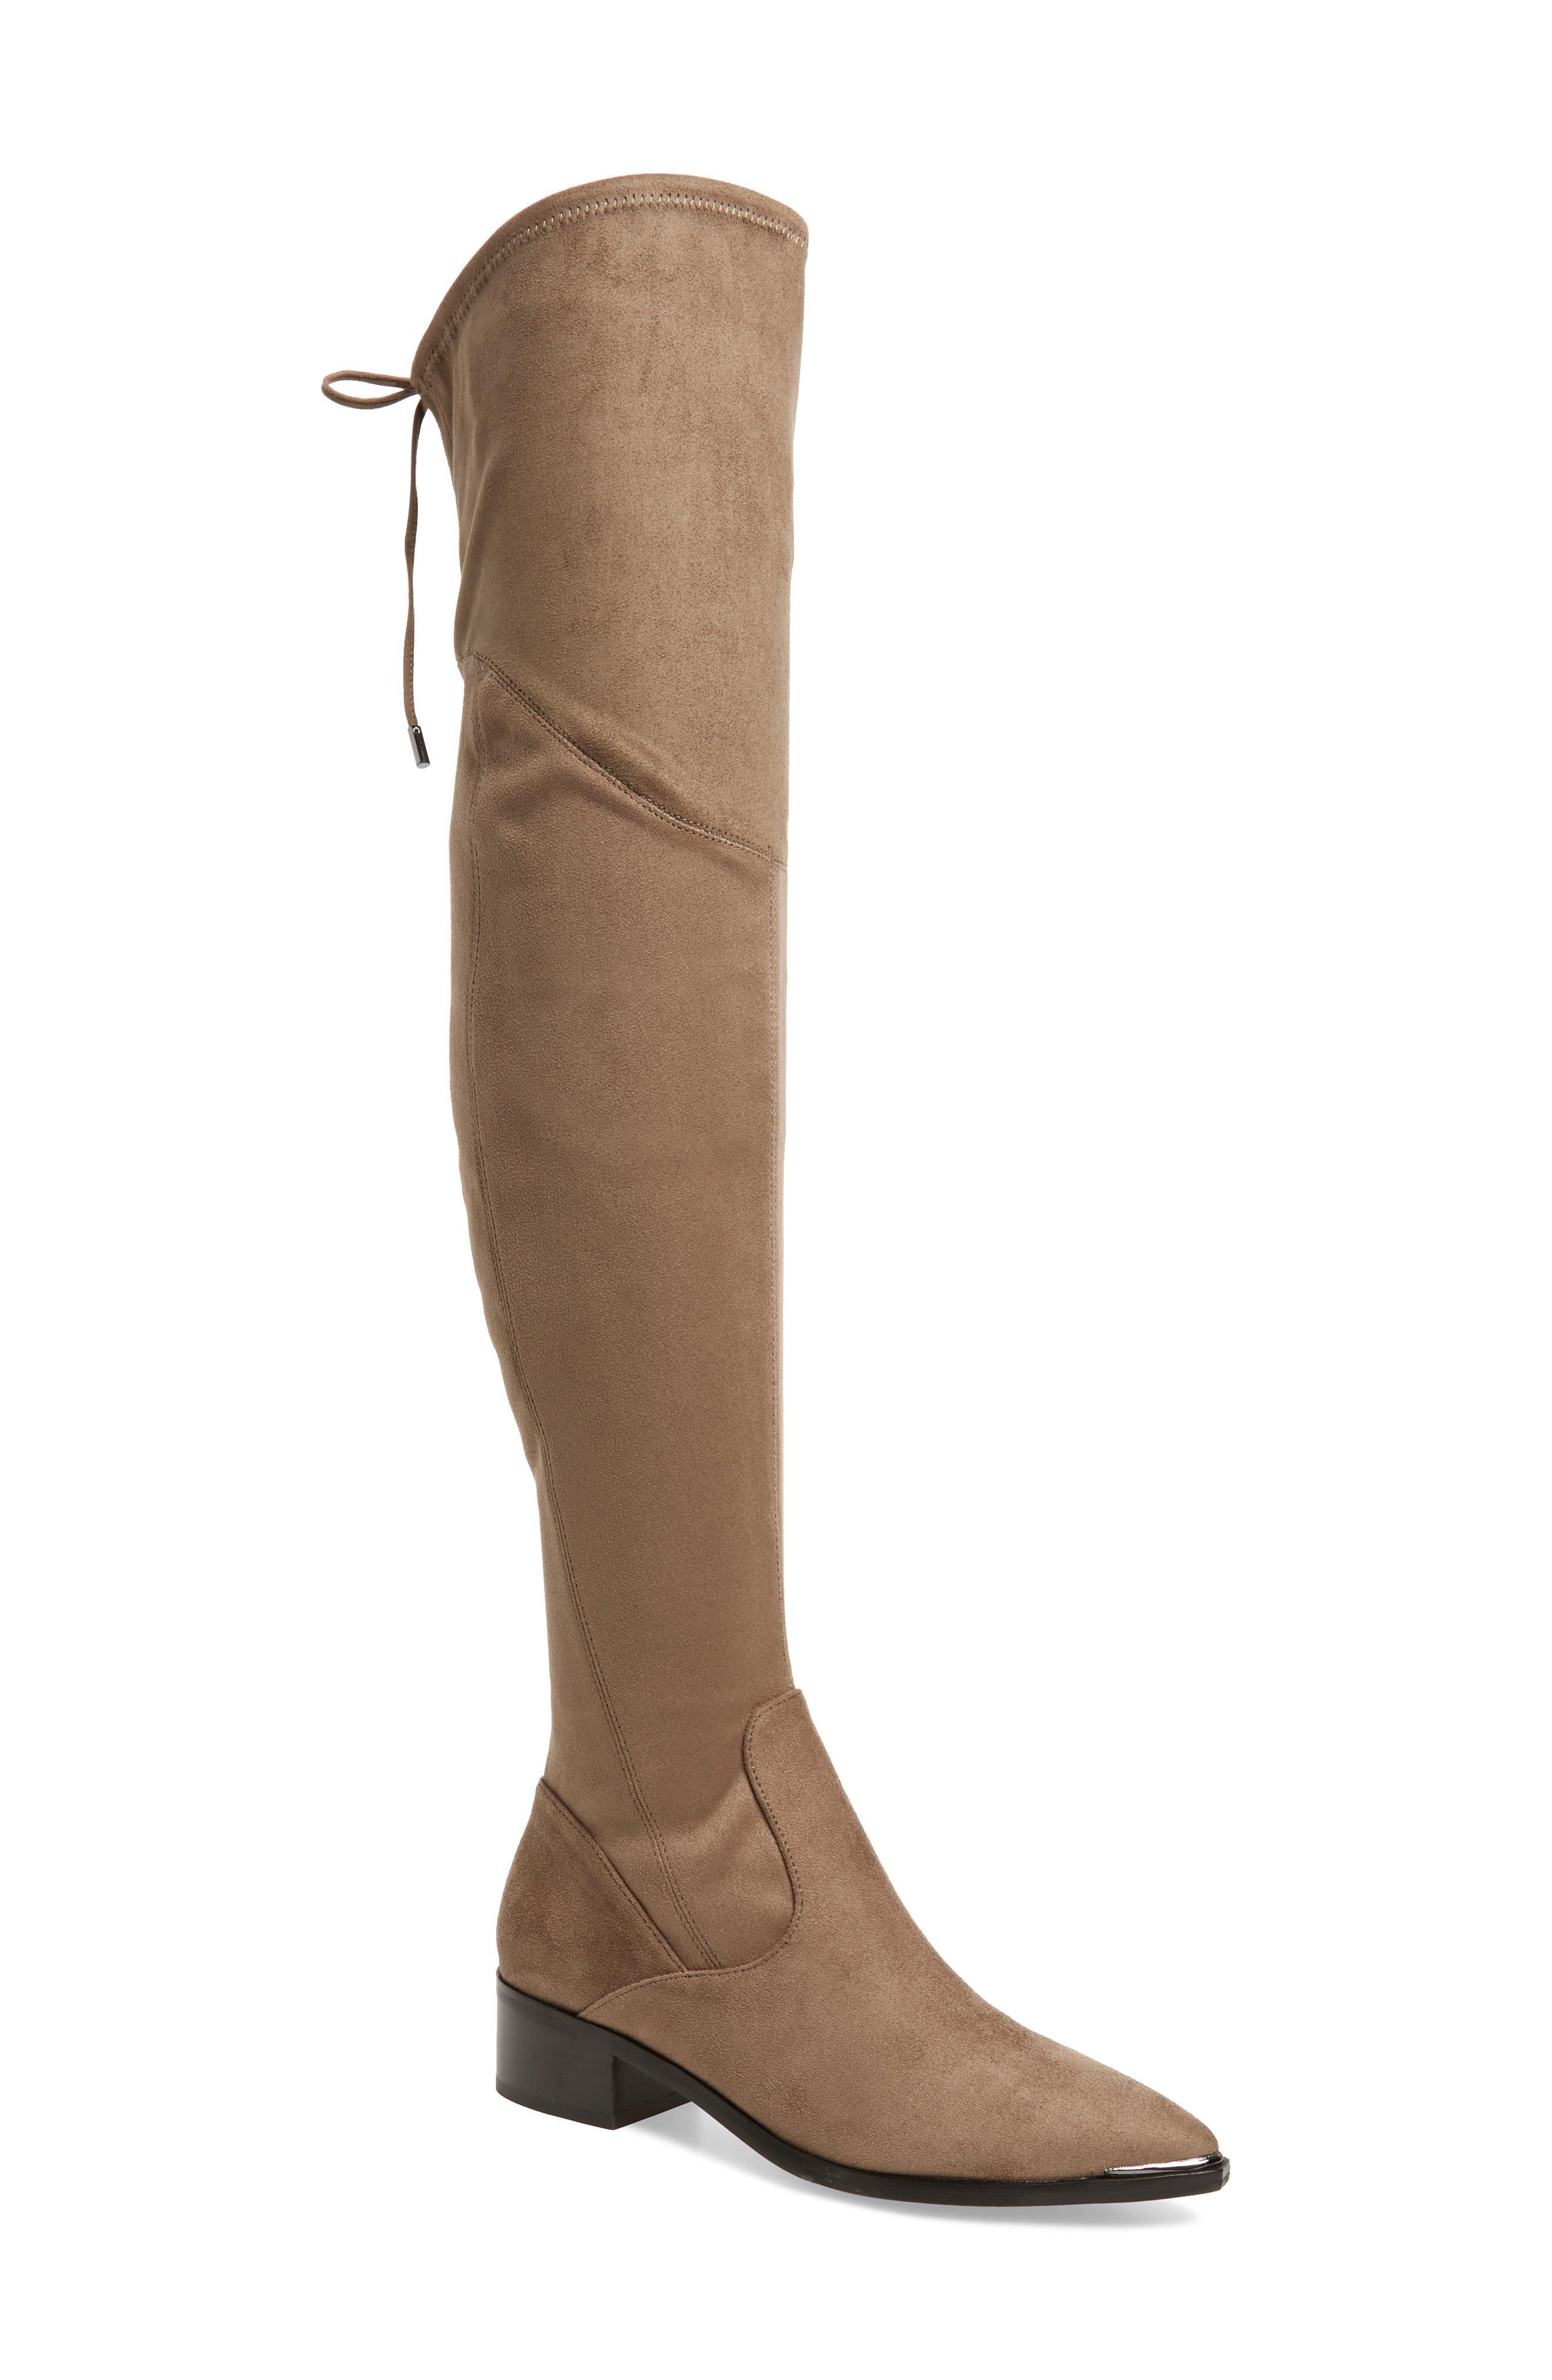 Marc Fisher LTD. Yuna Over the Knee Boot (Women) (Narrow Calf)